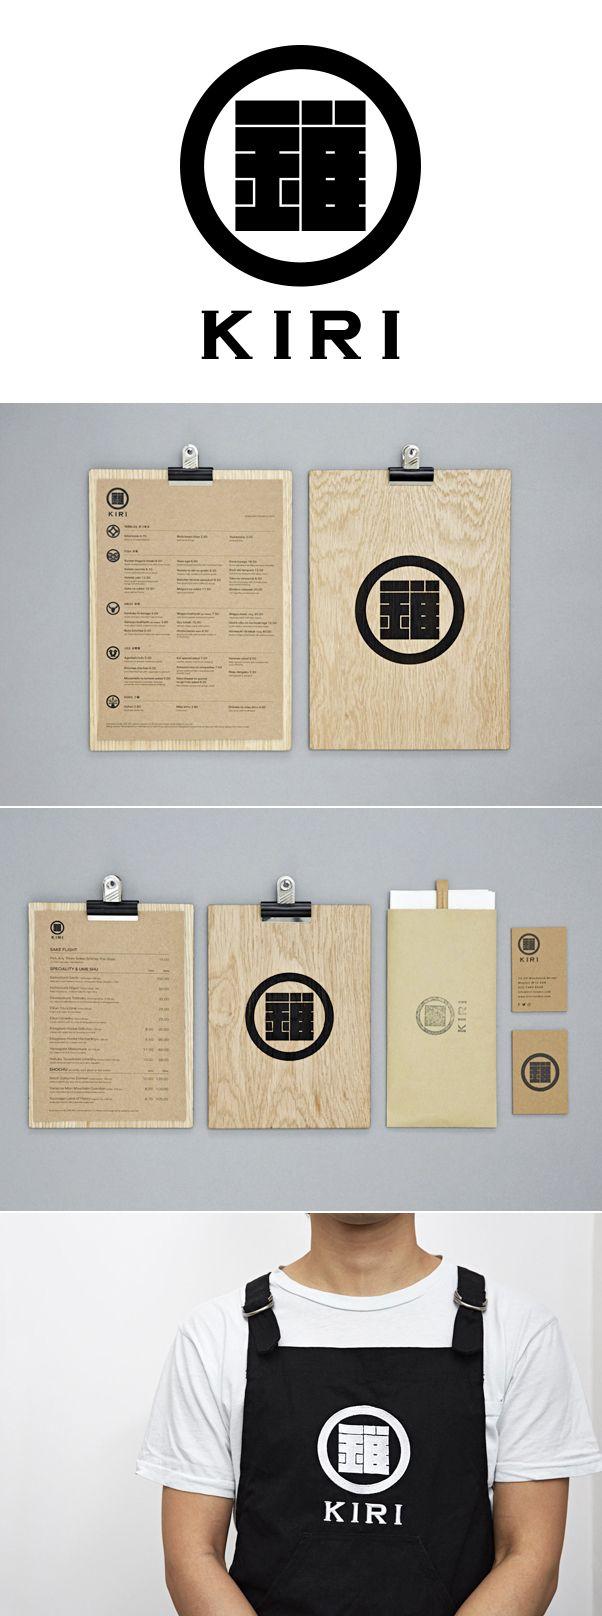 KIRI Japanese restaurant branding and design, menu, uniform #branding #logo #design #restaurant #menu #wood #board #card #kamon #kiri #apron #uniform designed by centrecreative